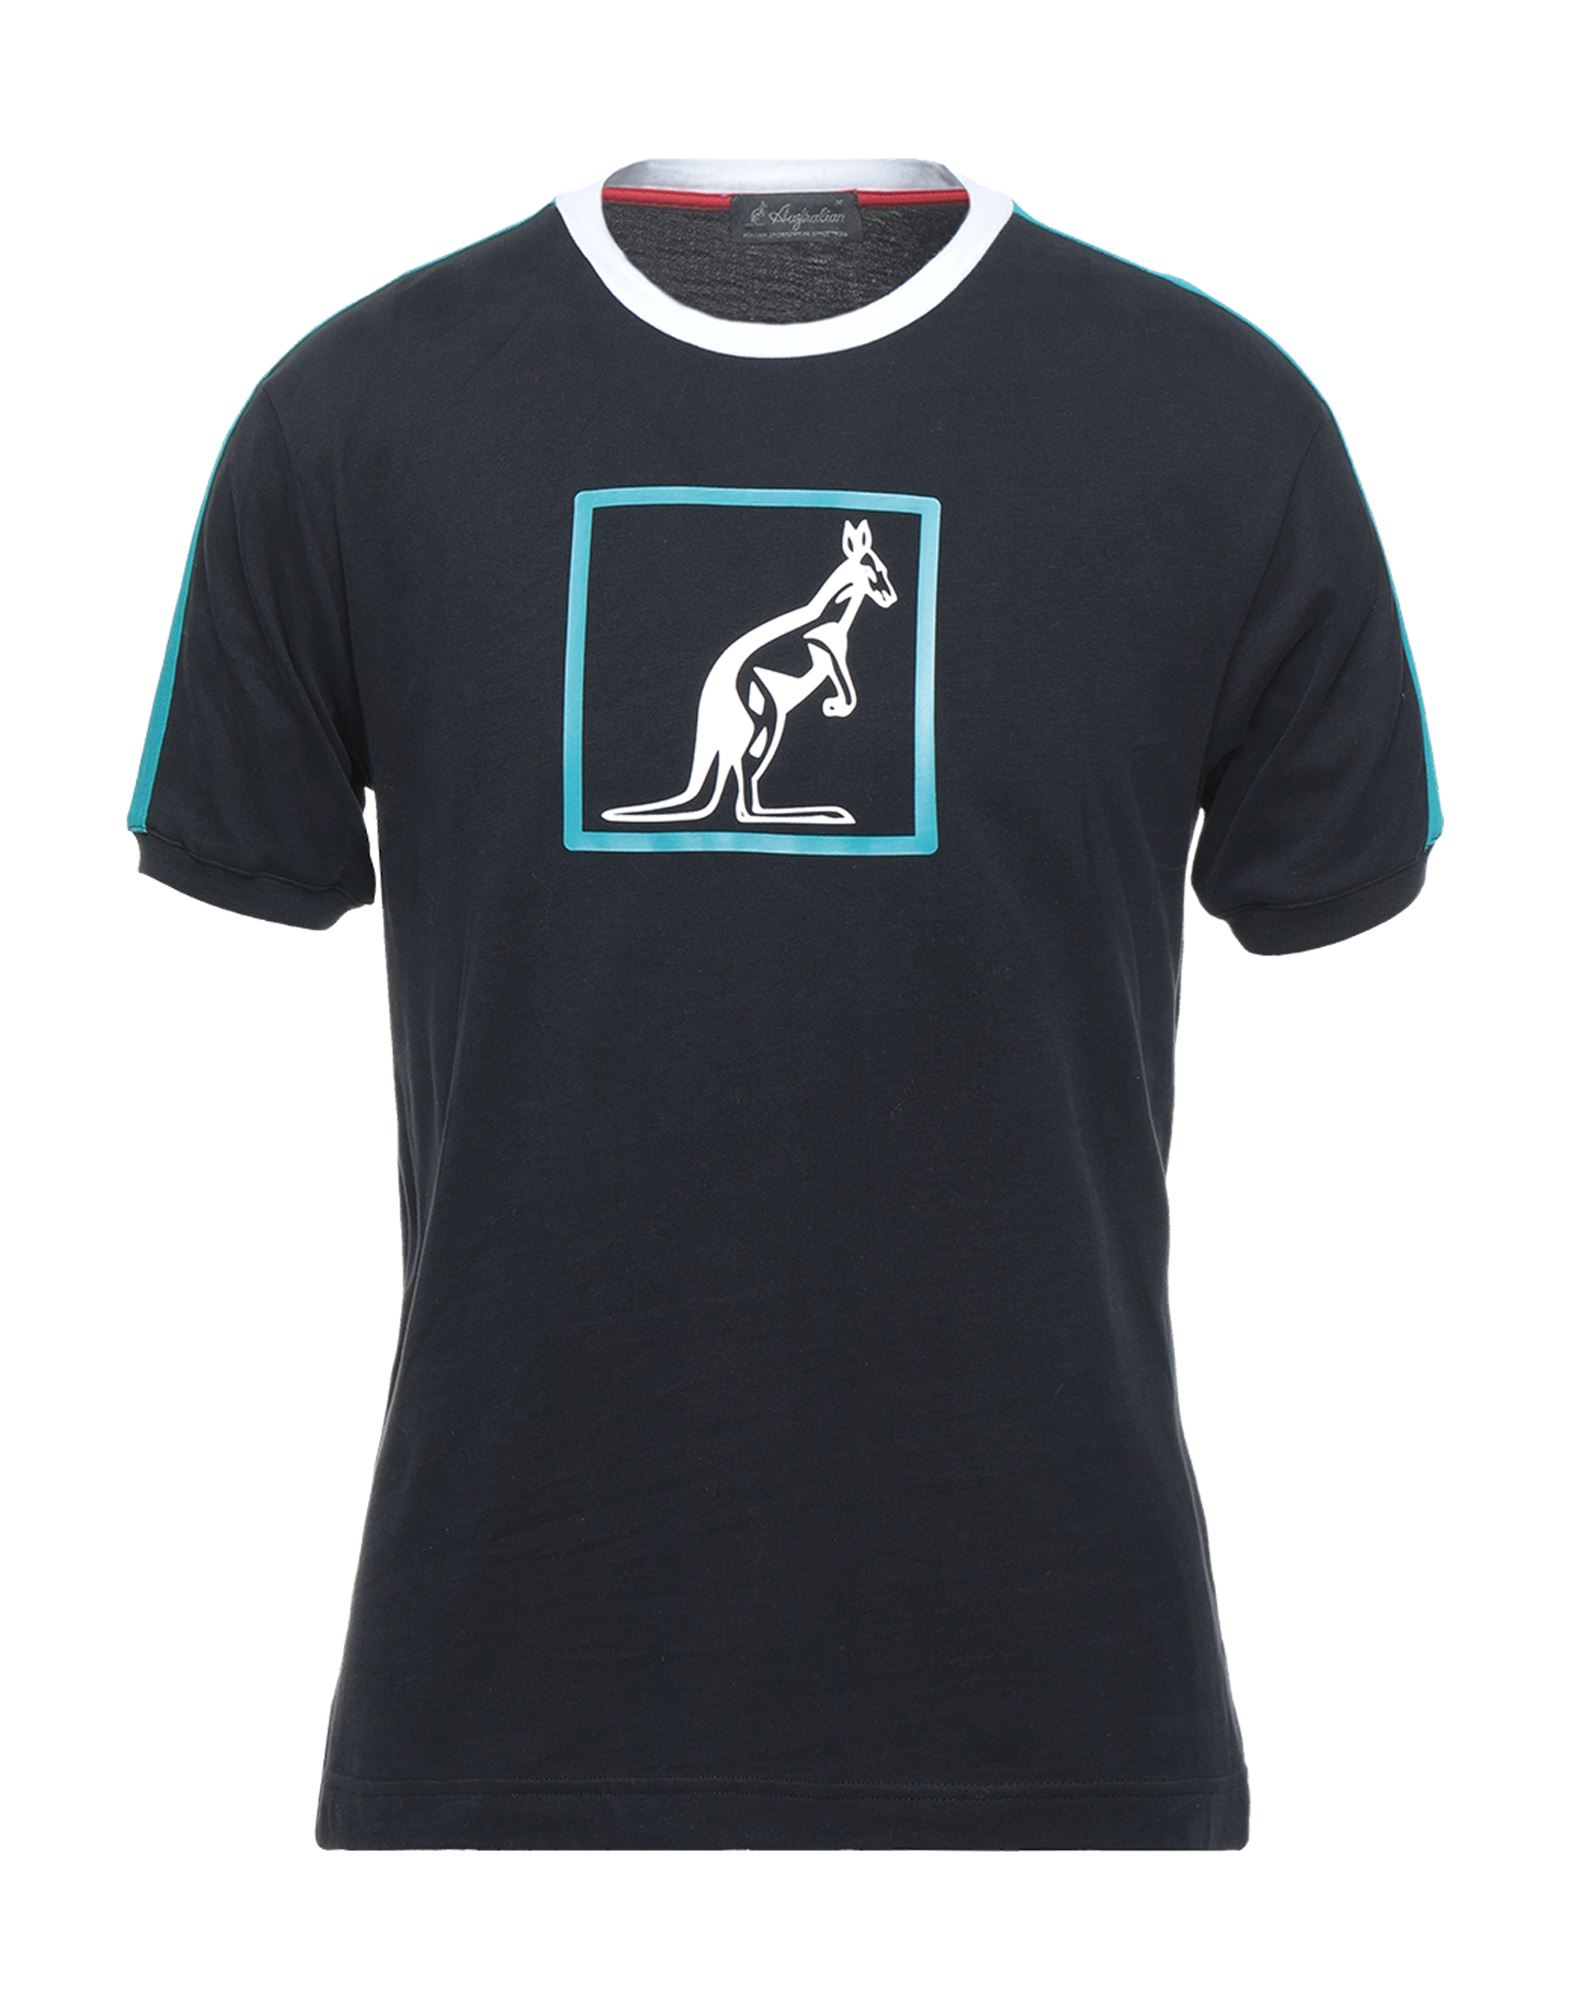 australian футболка AUSTRALIAN Футболка